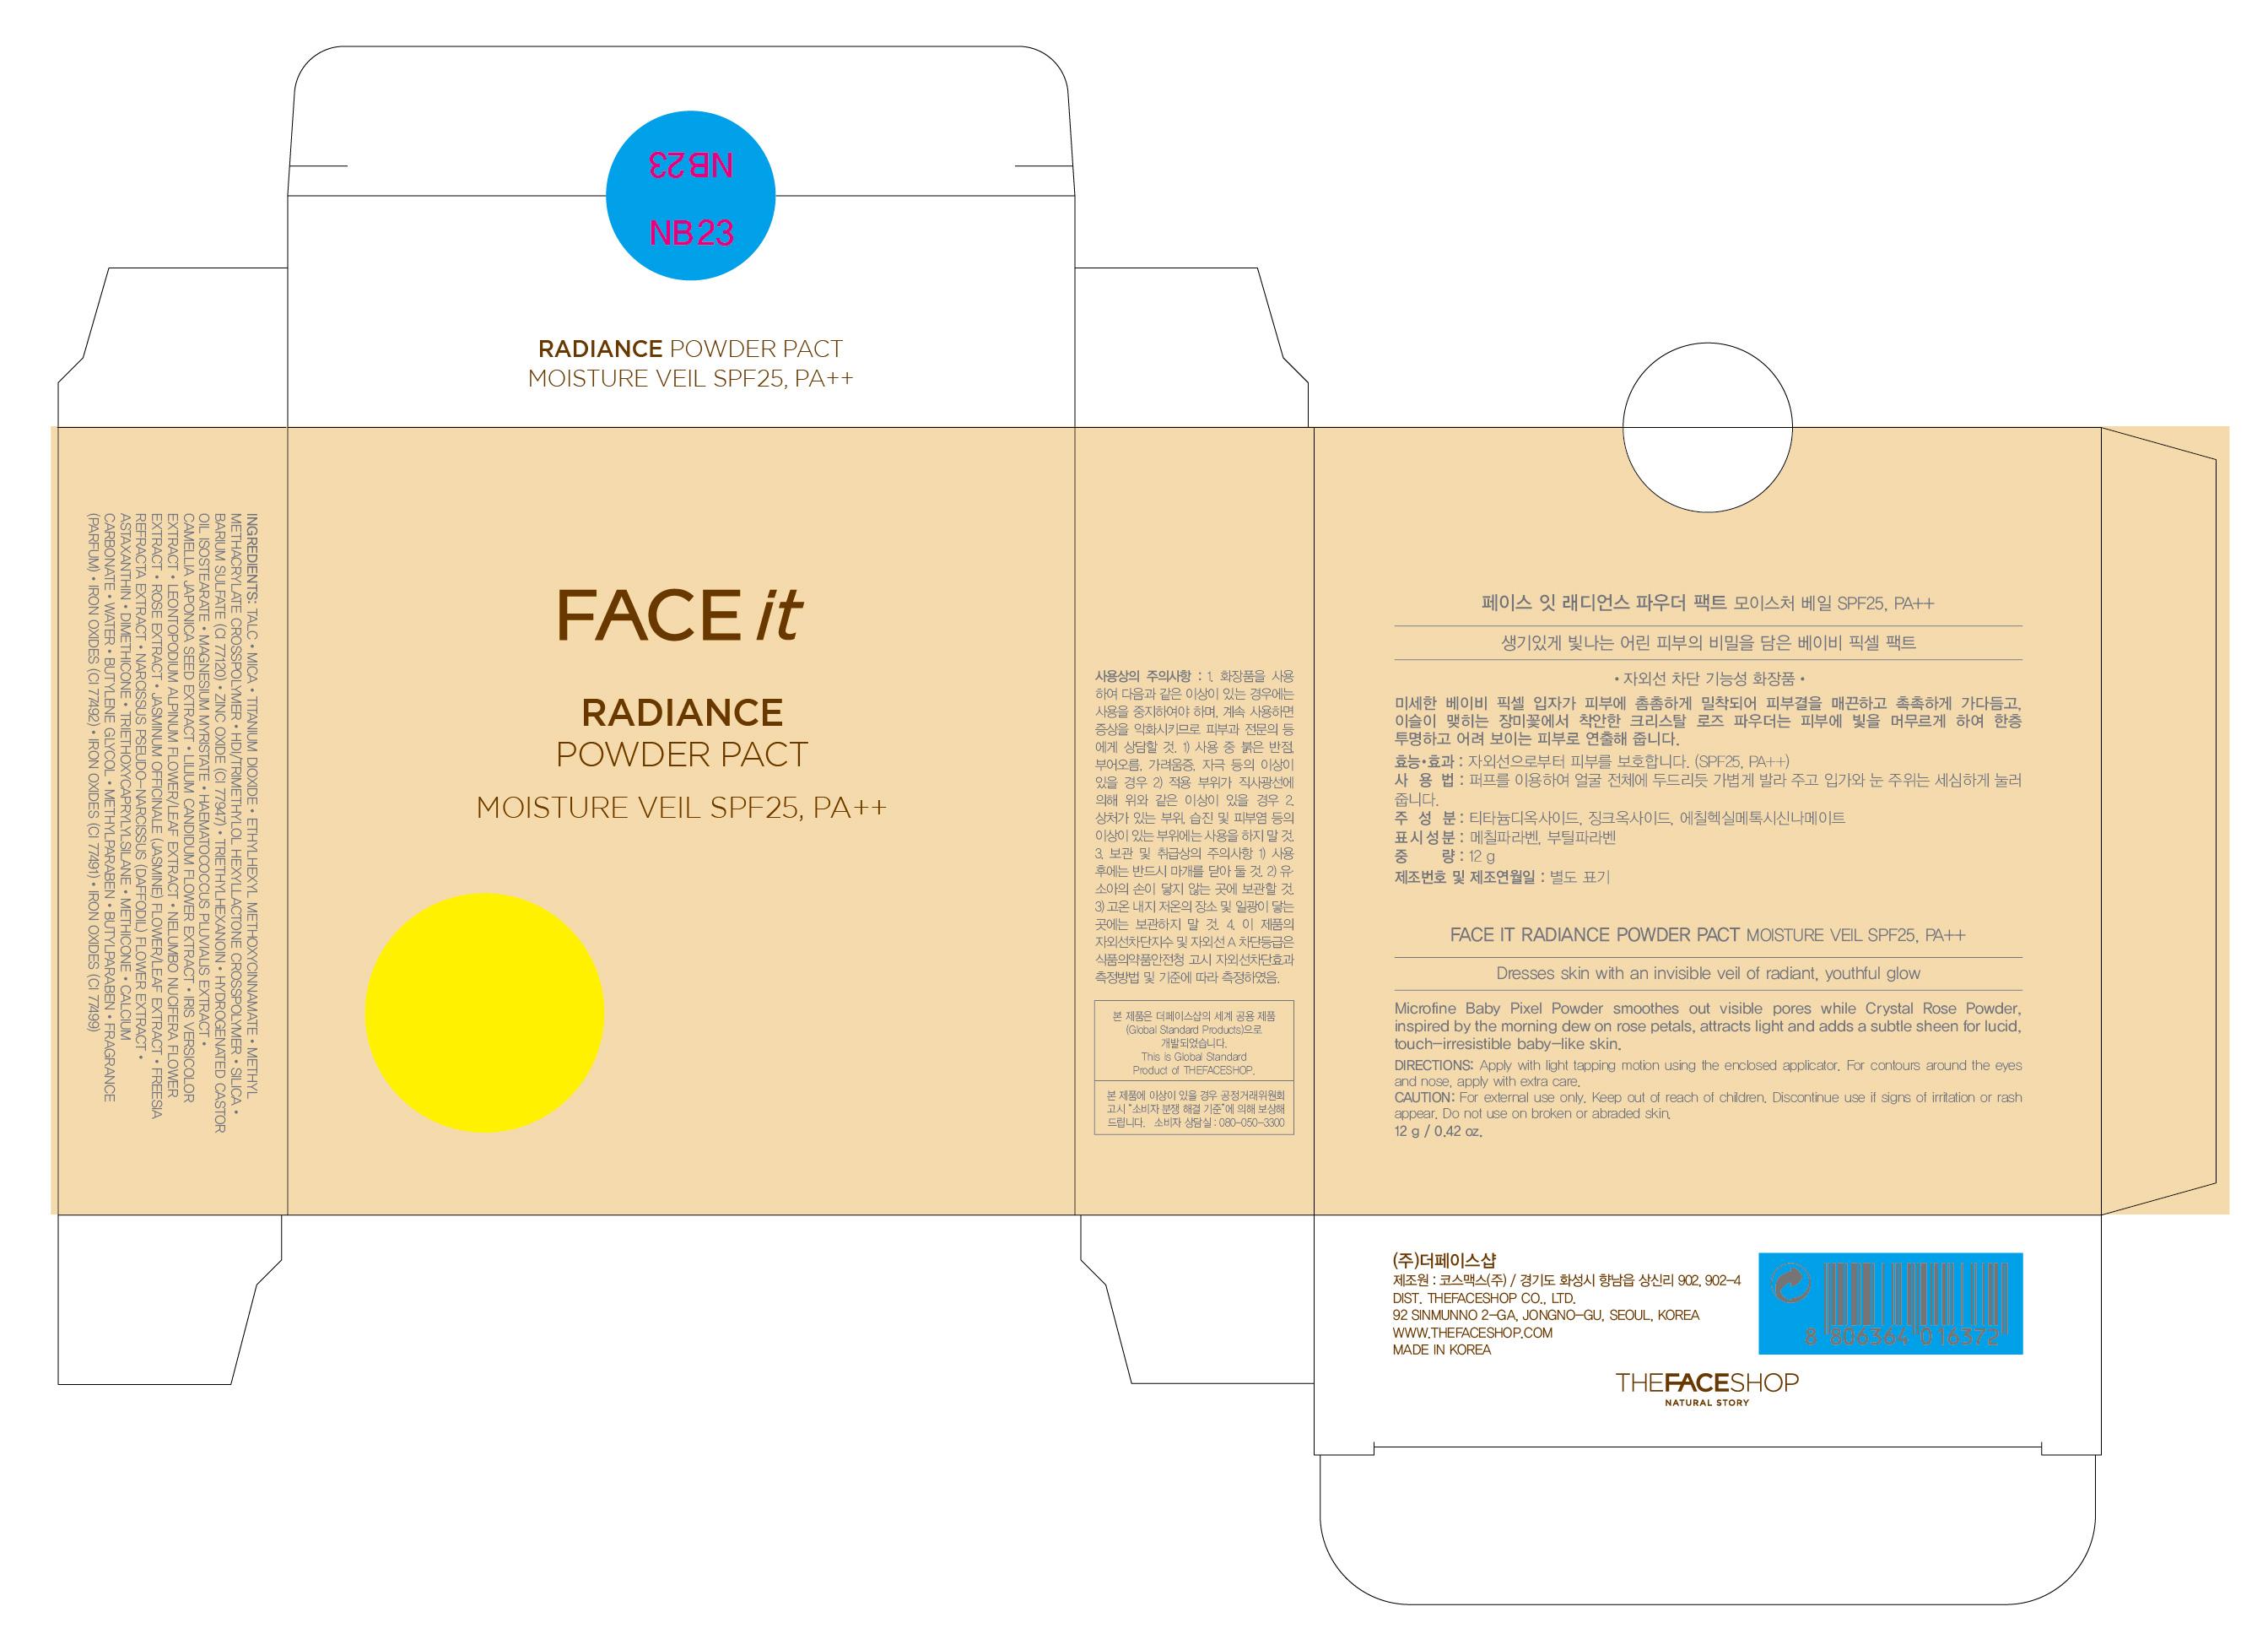 FACE IT RADIANCE POWDER PACT SPF25 MOISTURE VEIL NB23